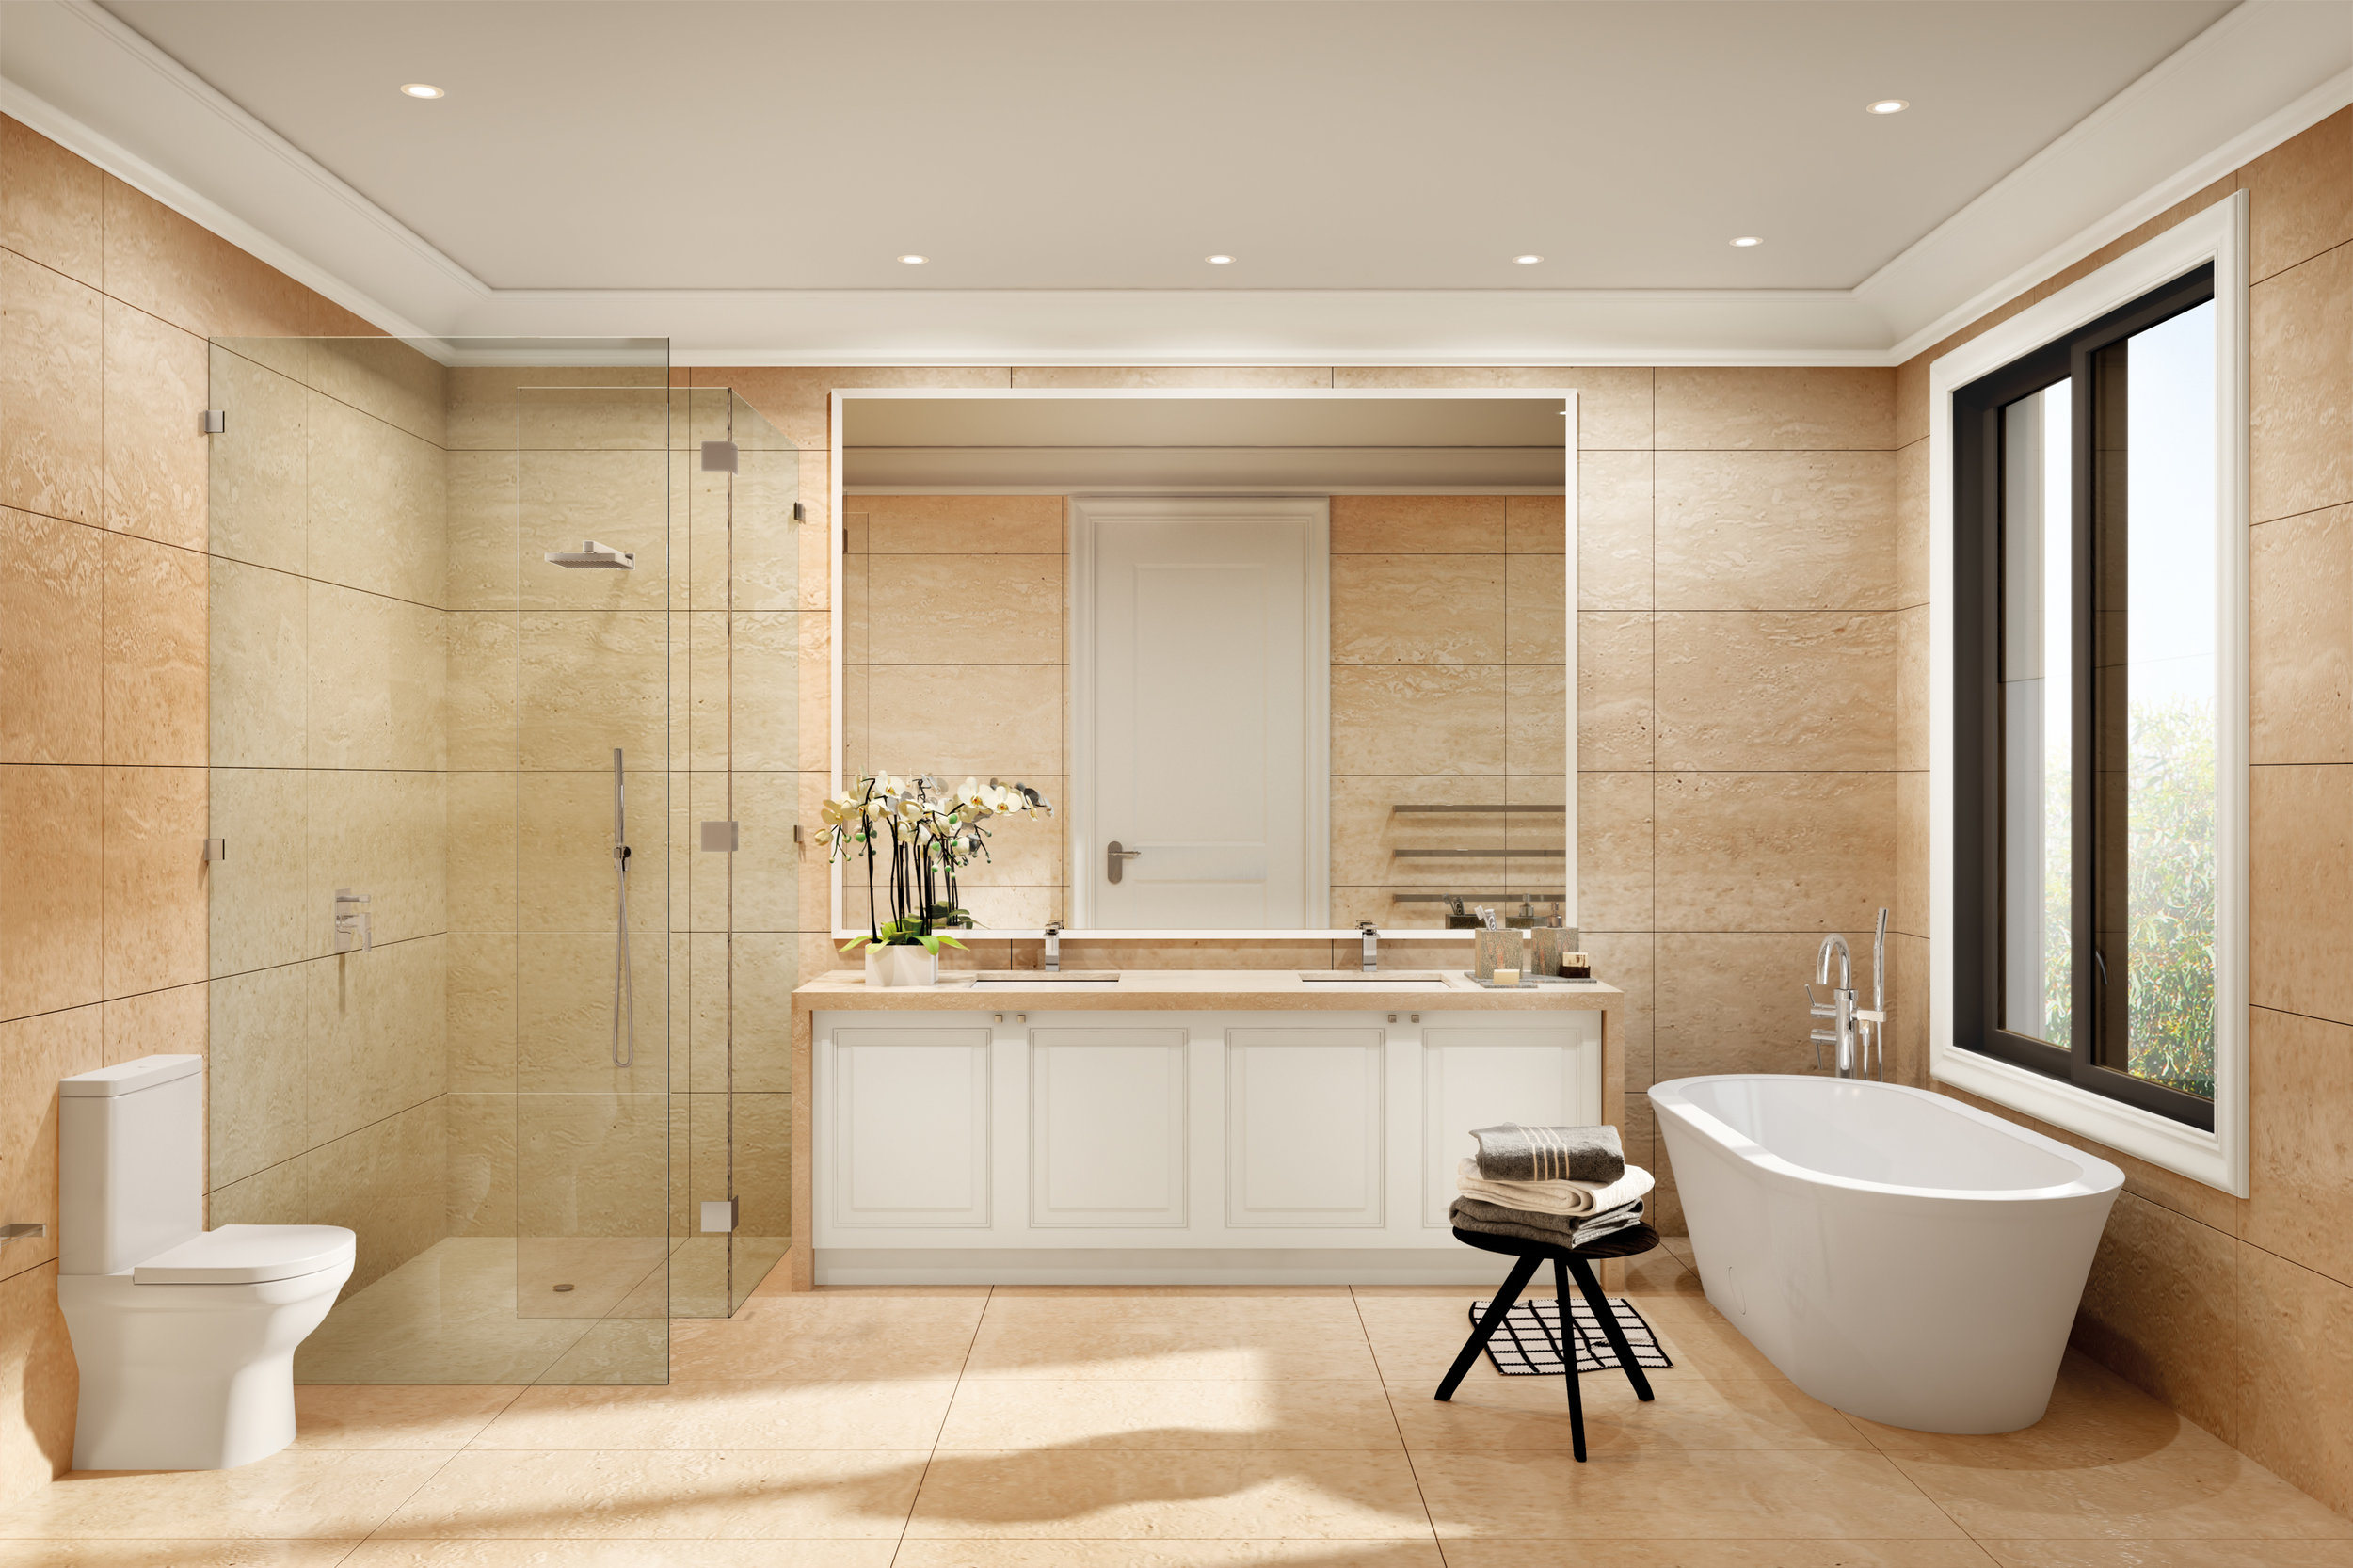 BBIR600324_145_Cotham_Rd_Apt5_Bathroom.jpg